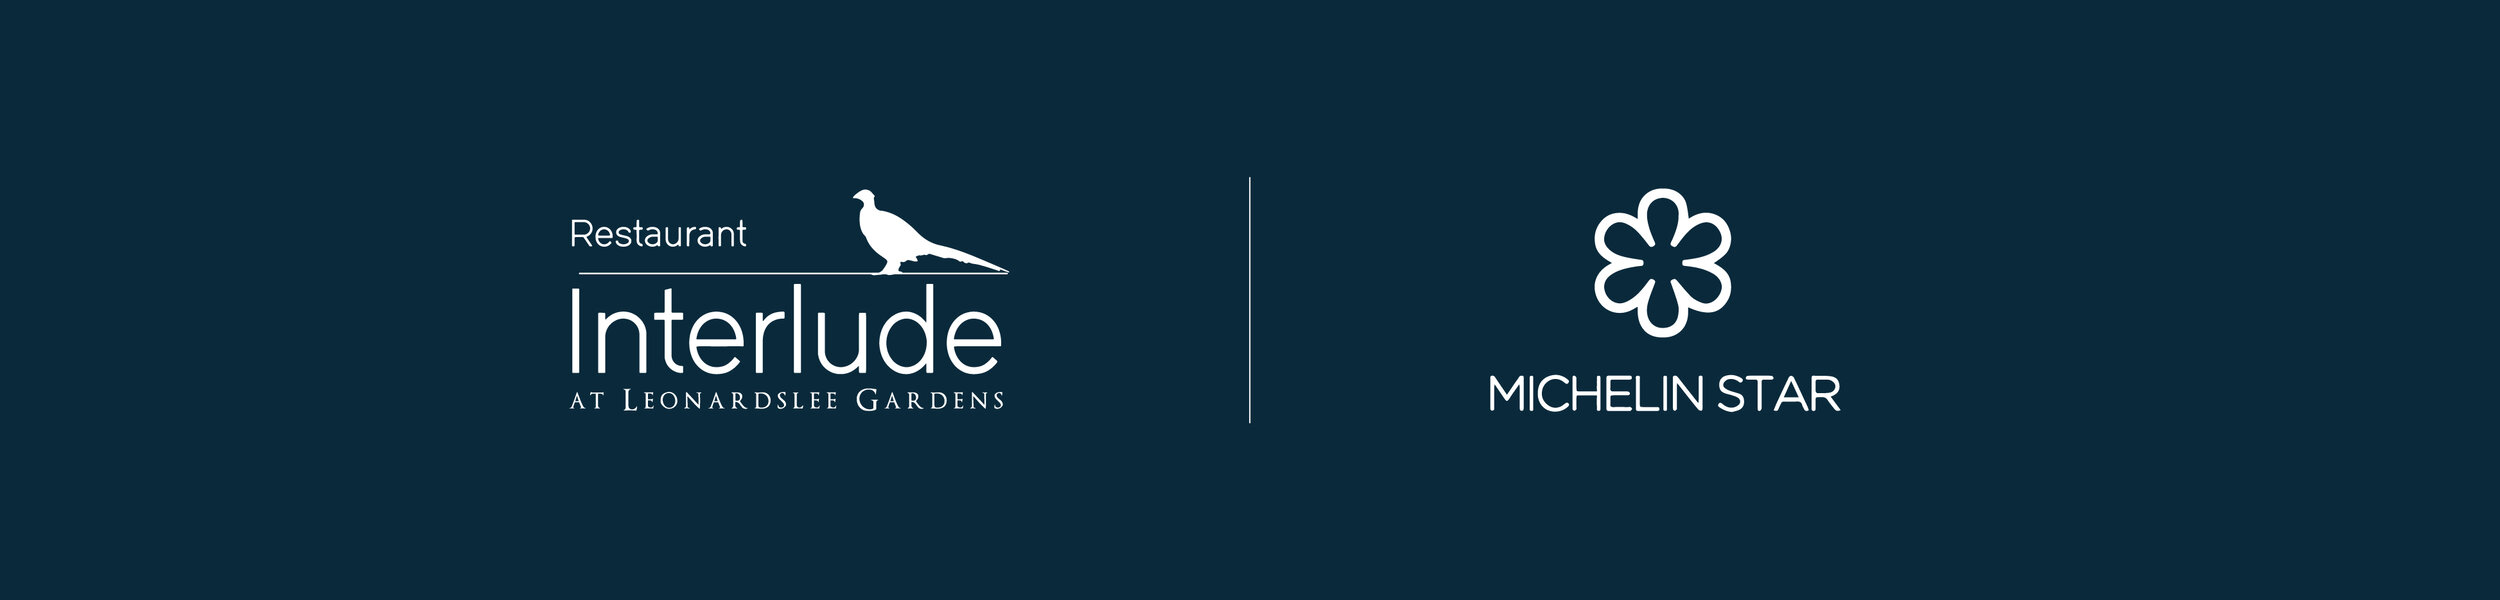 Michelin Star Interlude.jpg